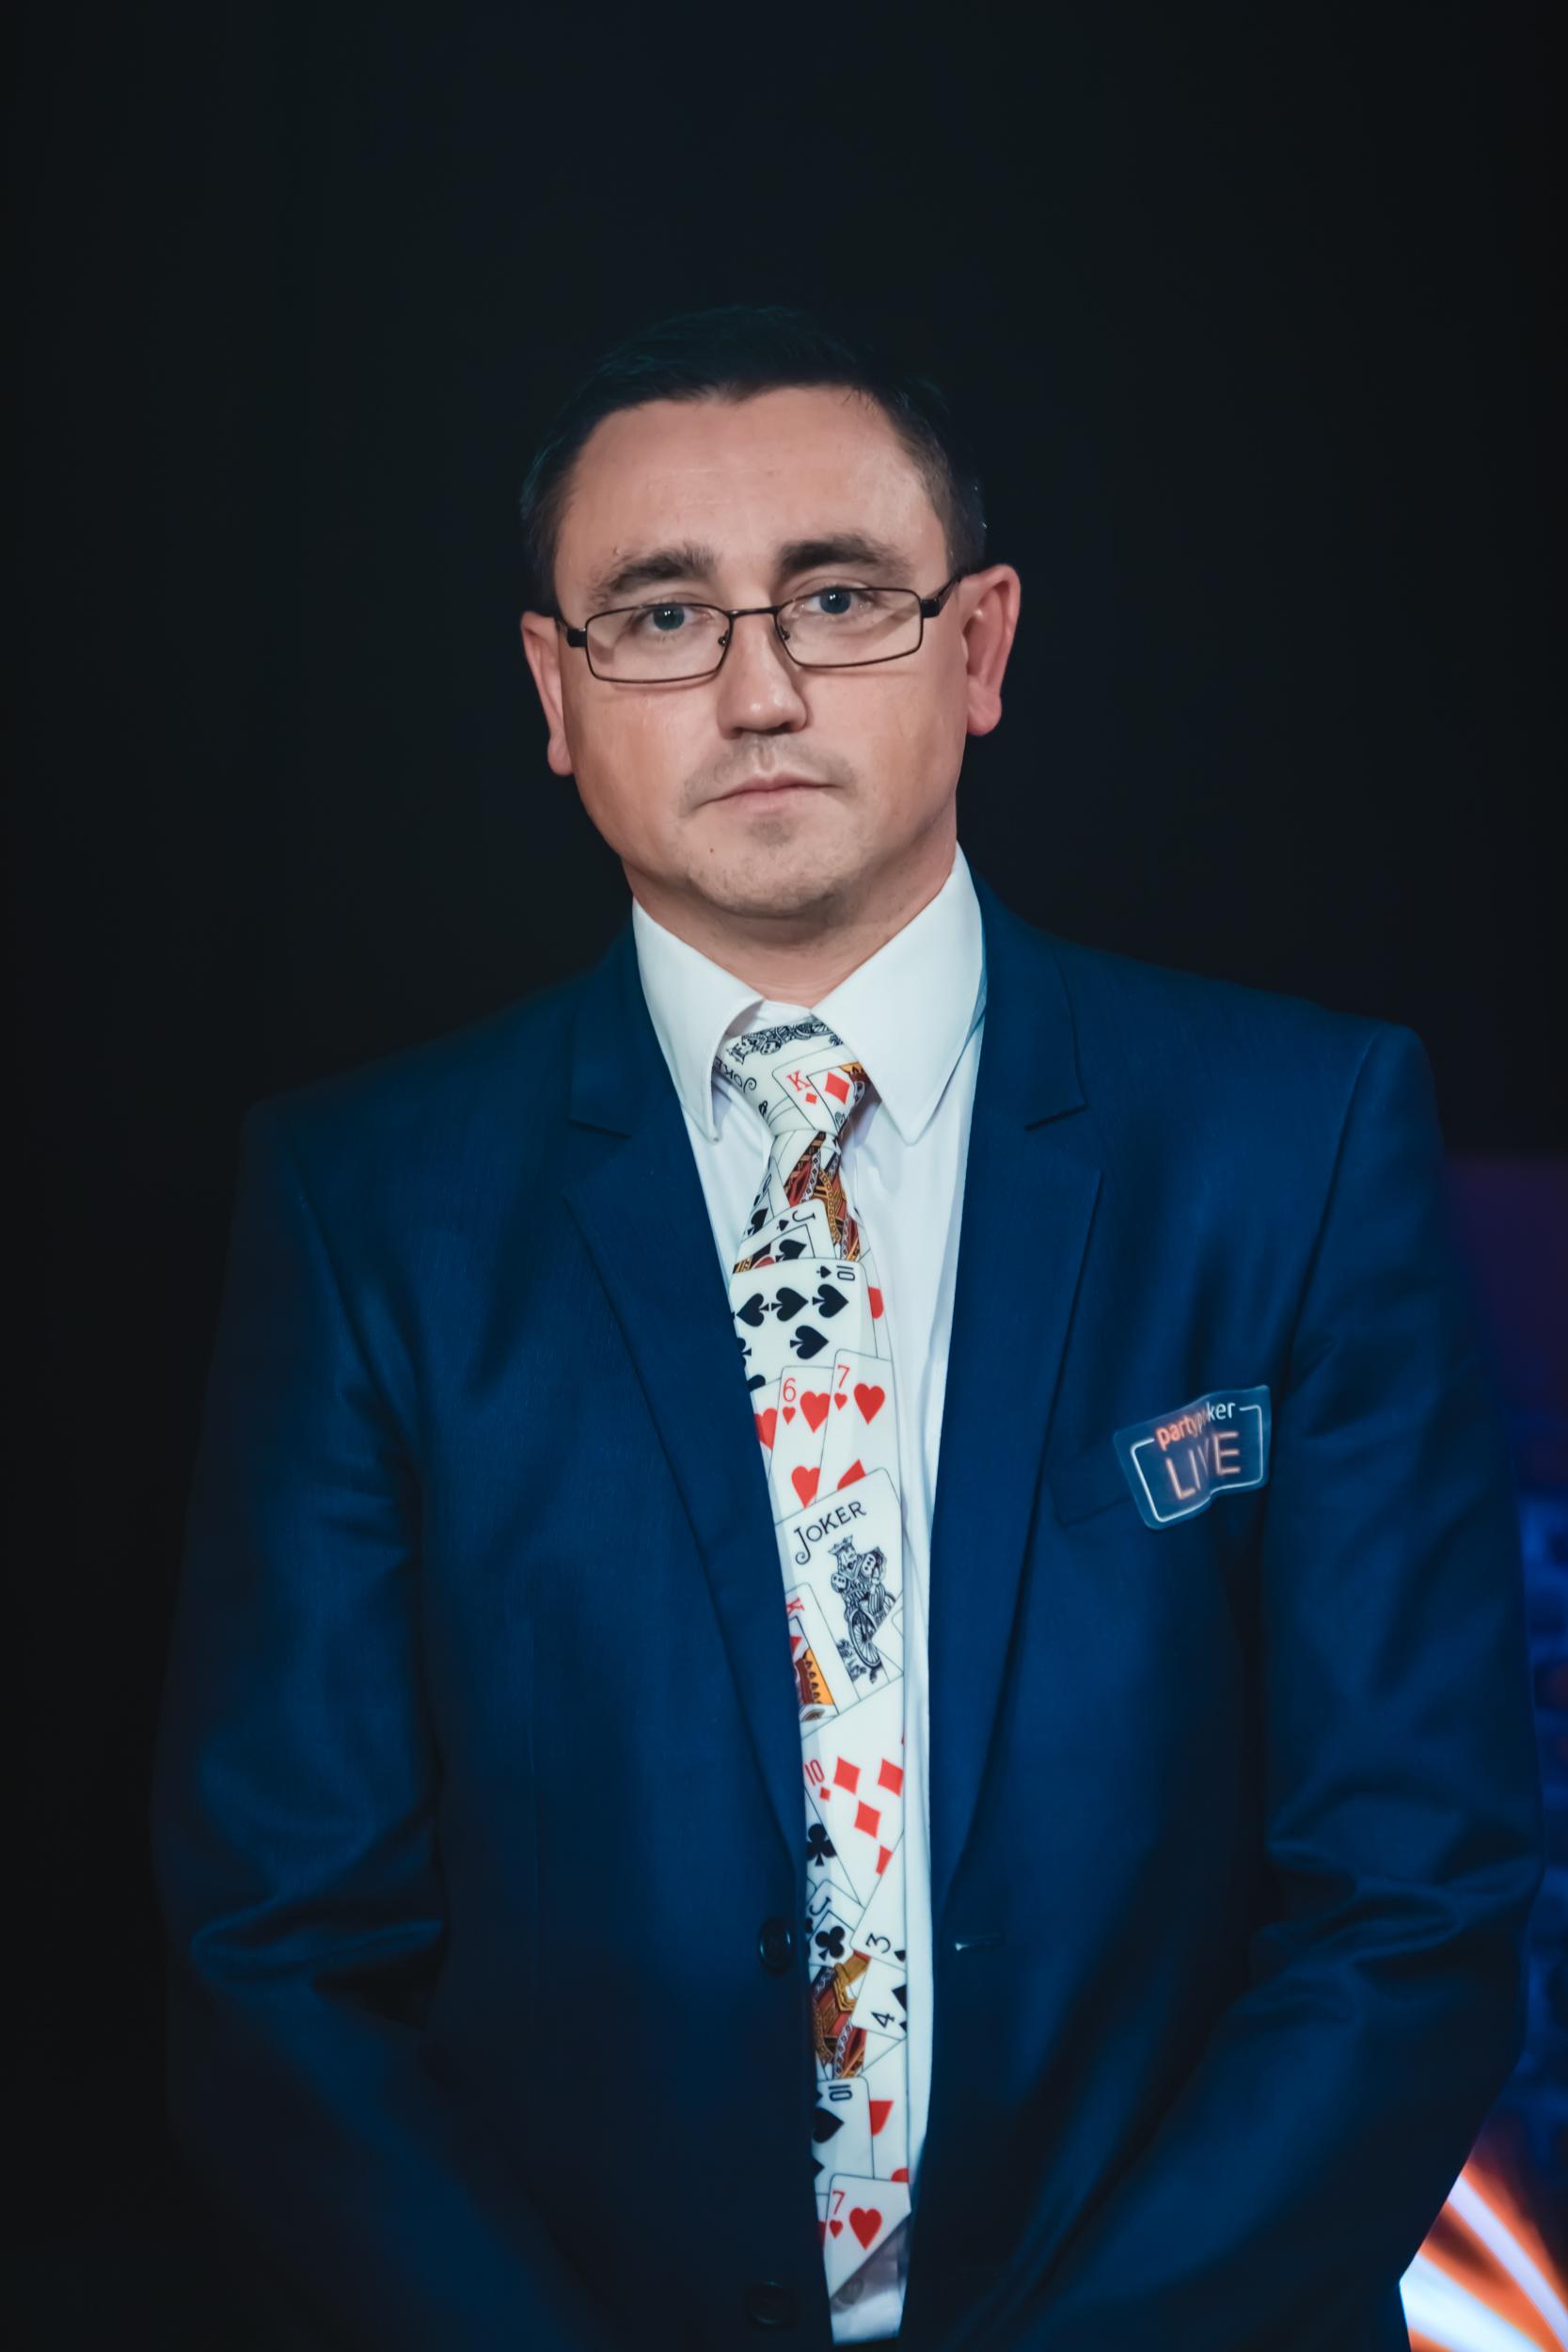 Sergey Petin